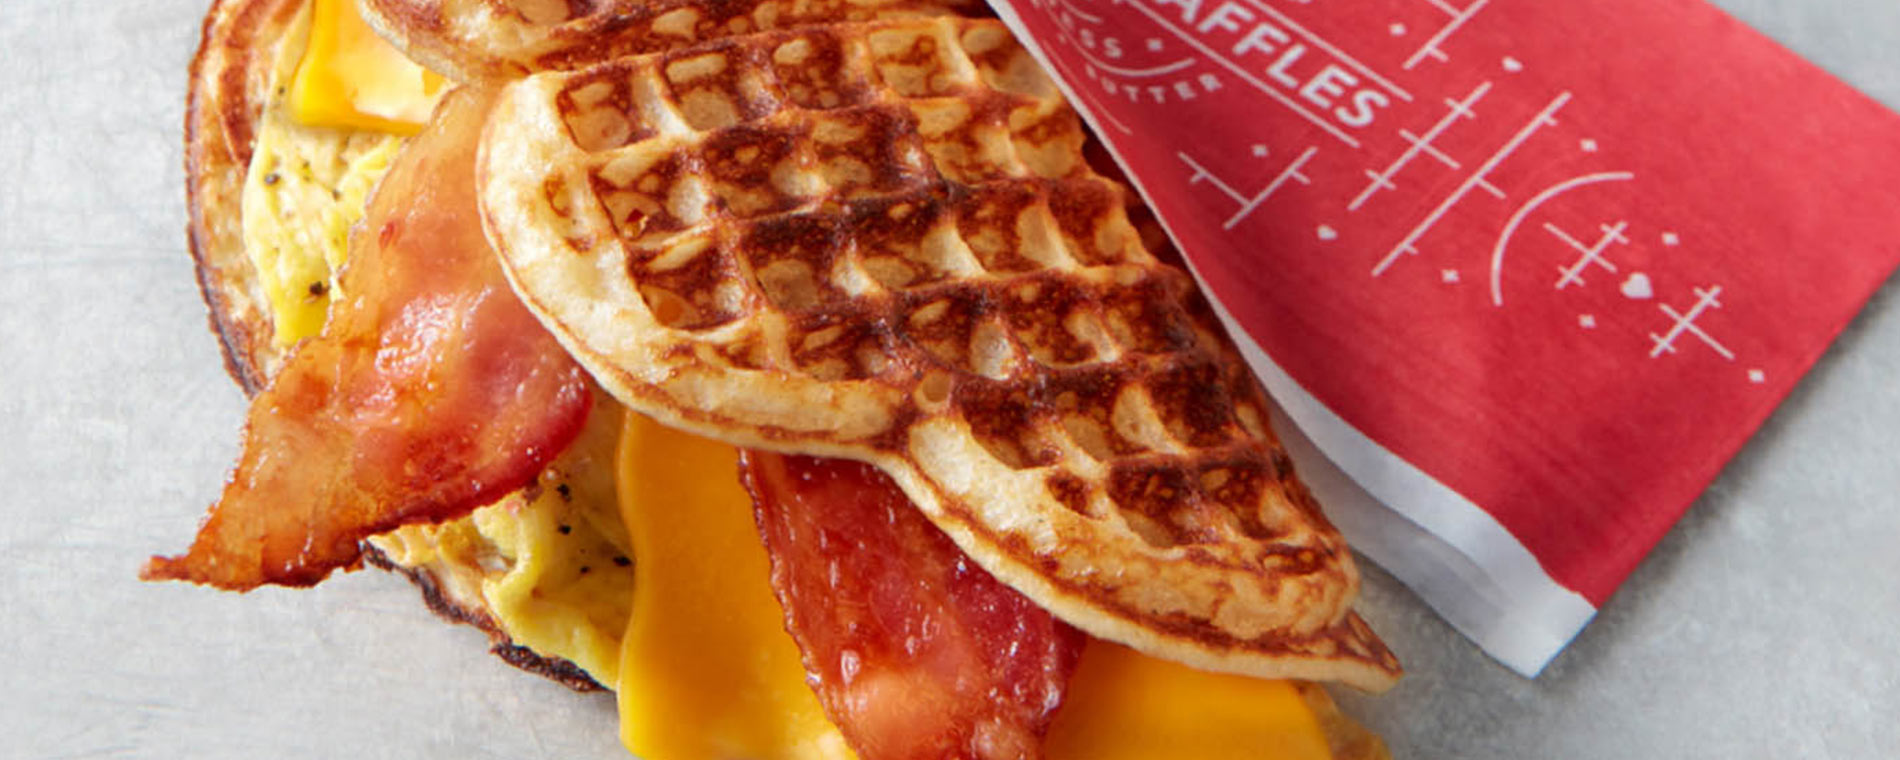 vf-nordic-waffles-banner.jpg